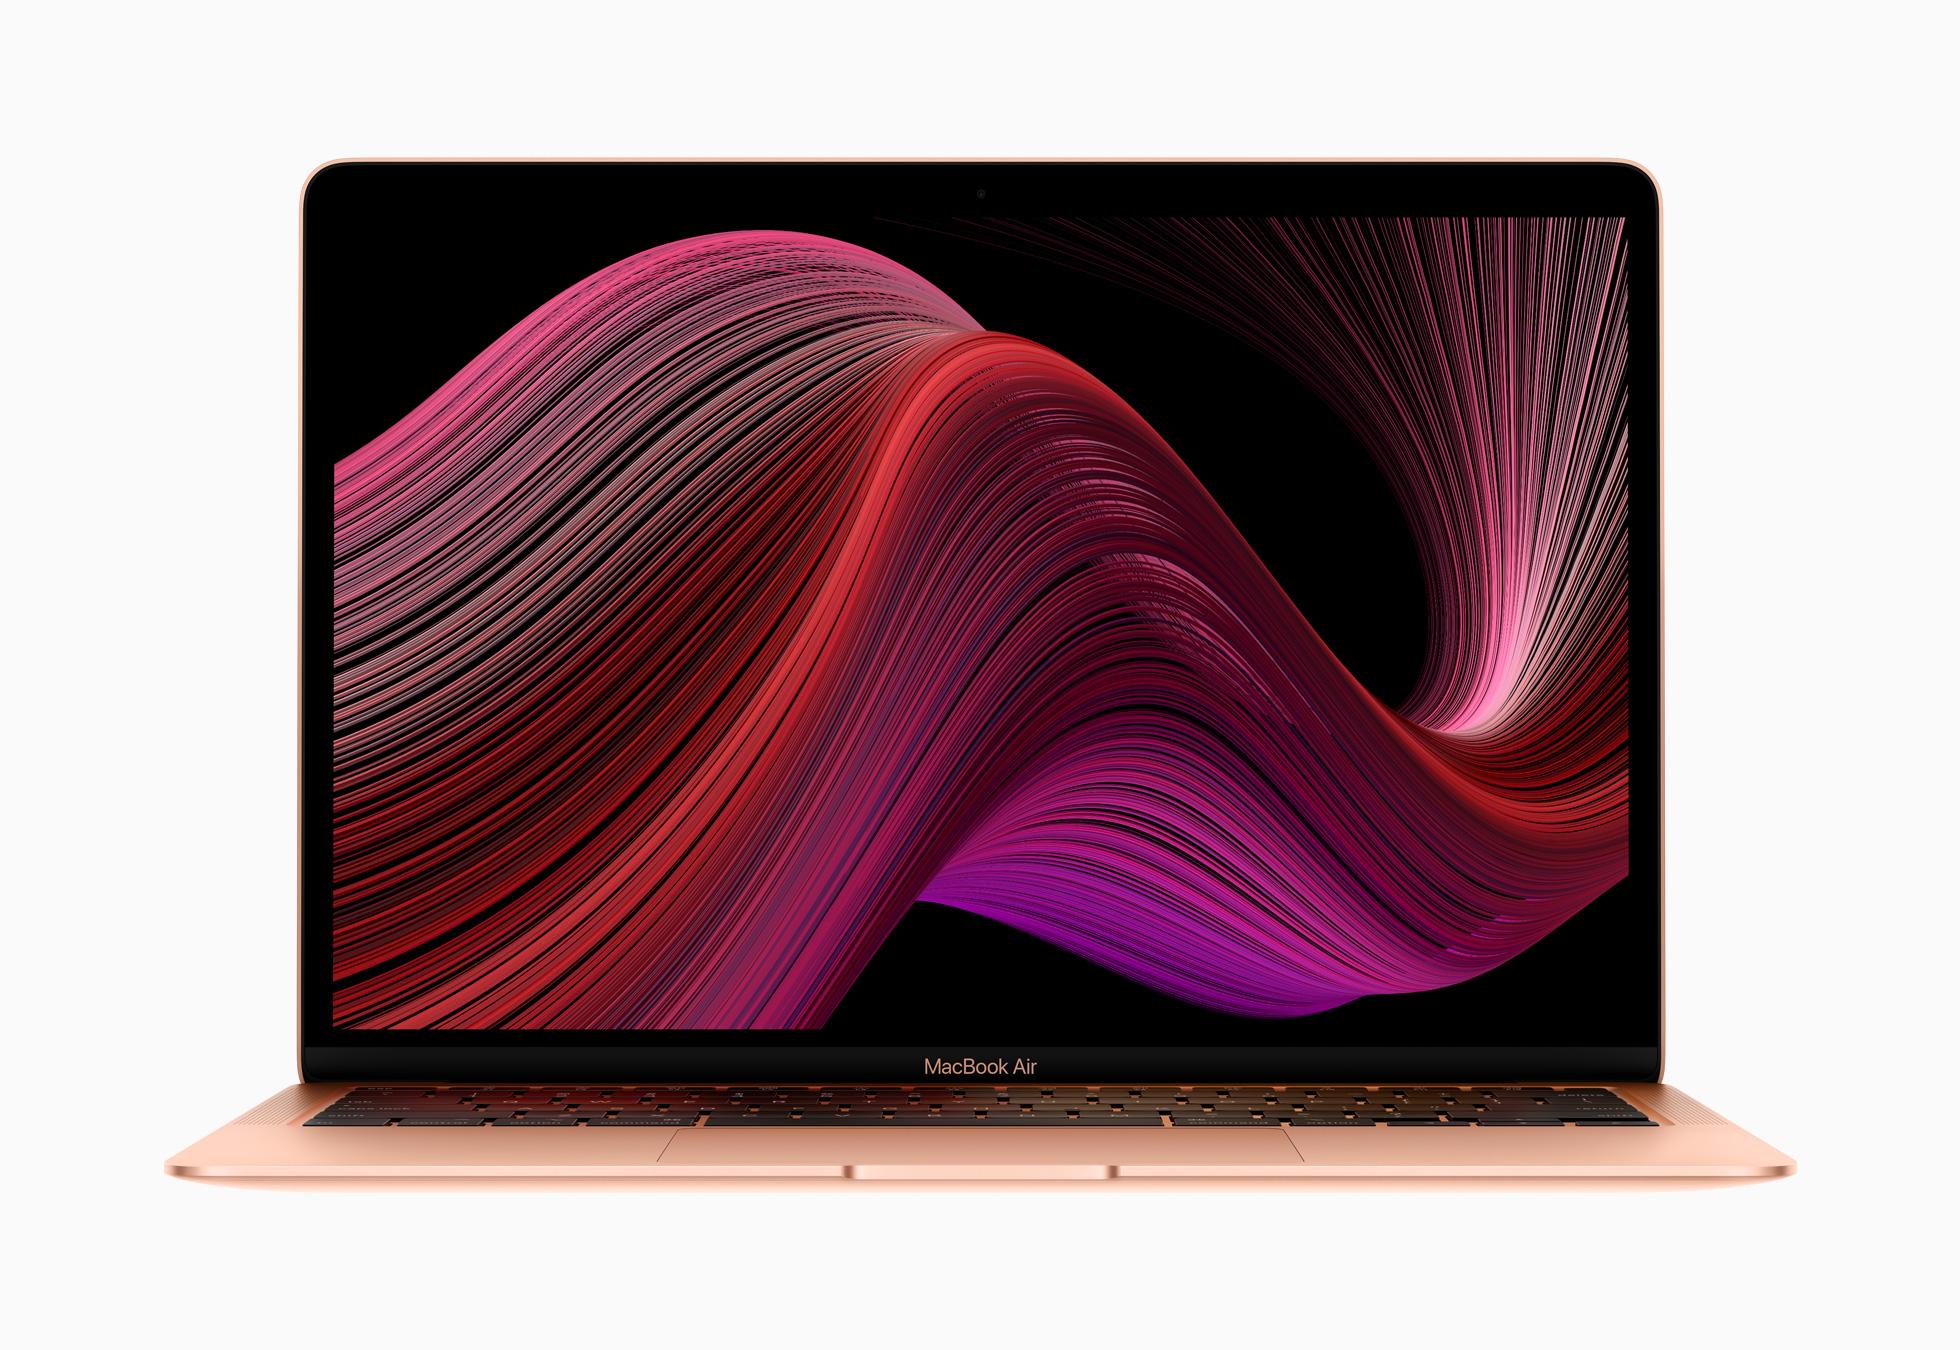 Apple - iPad Pro, Magic Keyboard, Macbook Air Release